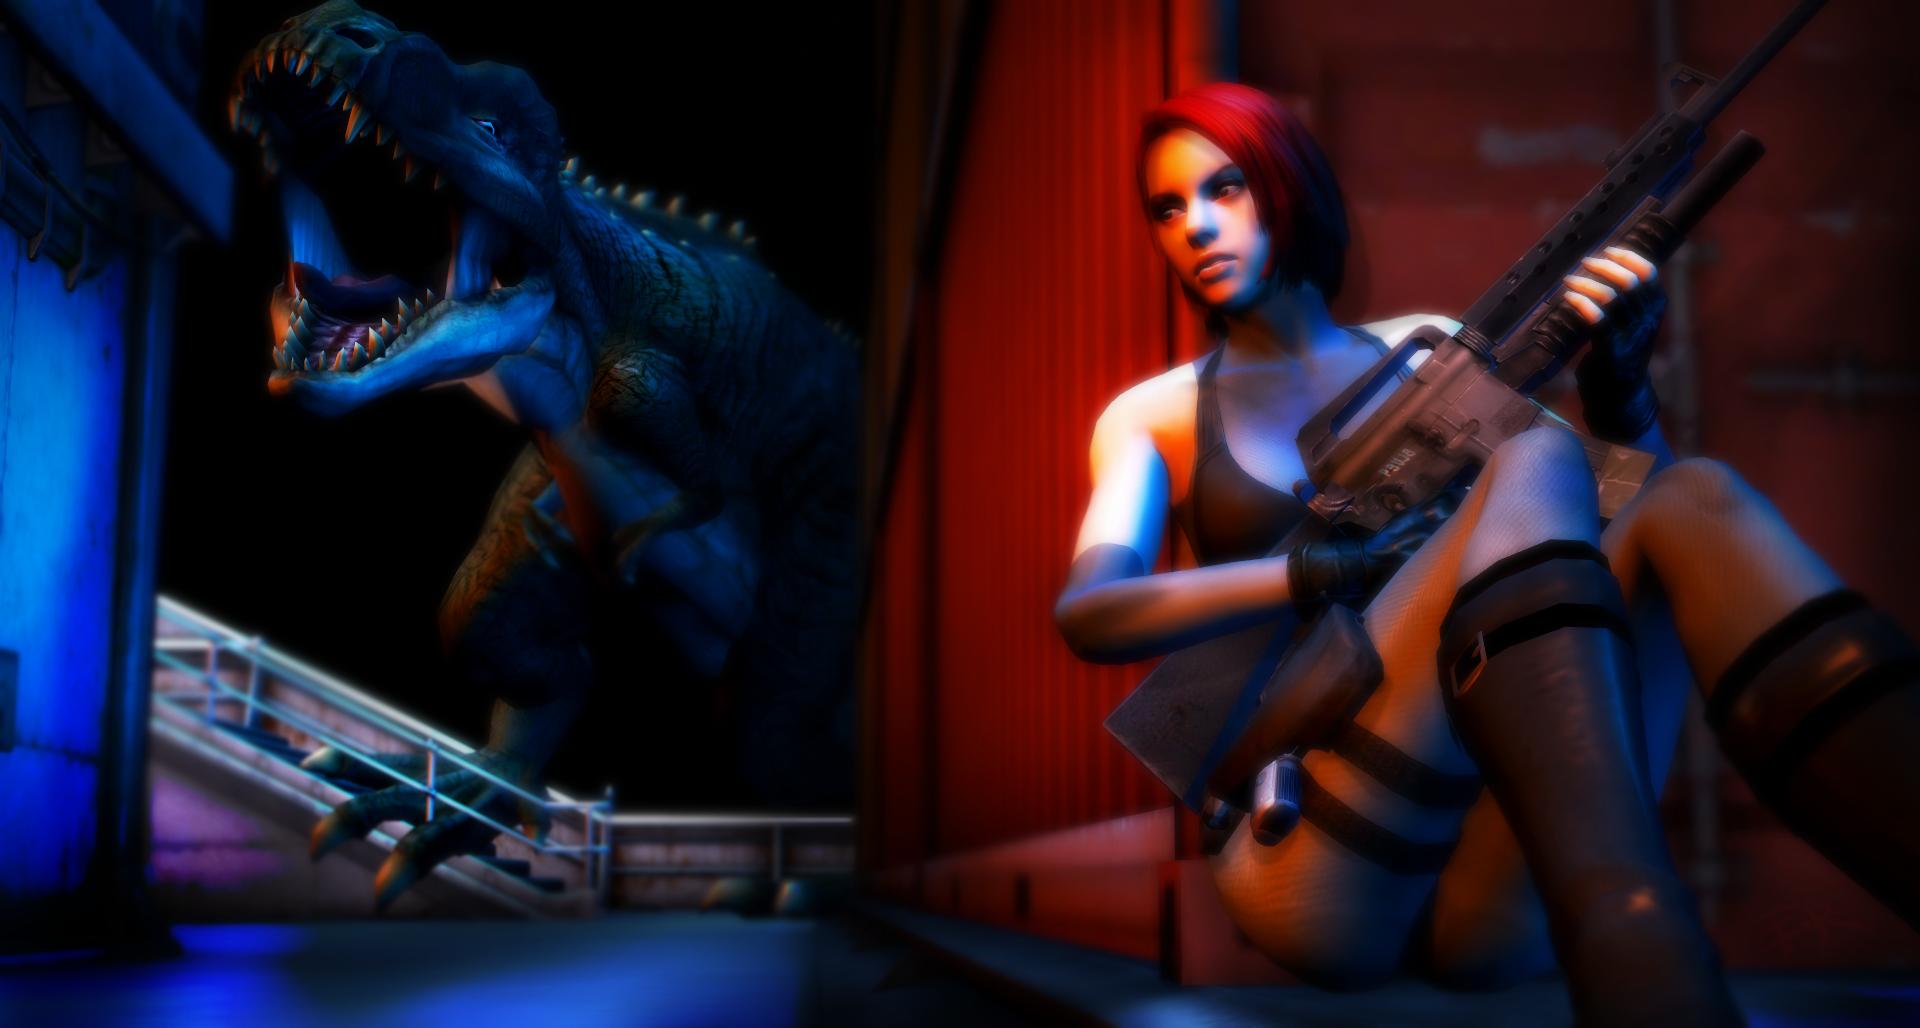 Regina Vs T-rex by IIReII